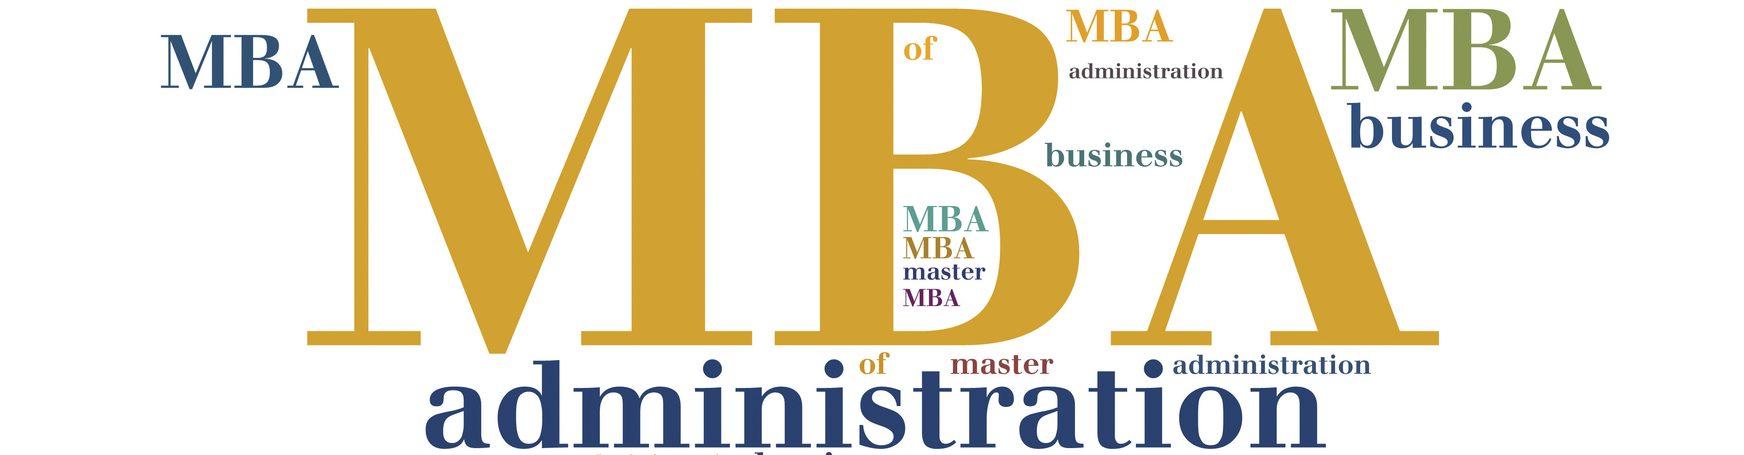 3 day MBA program training